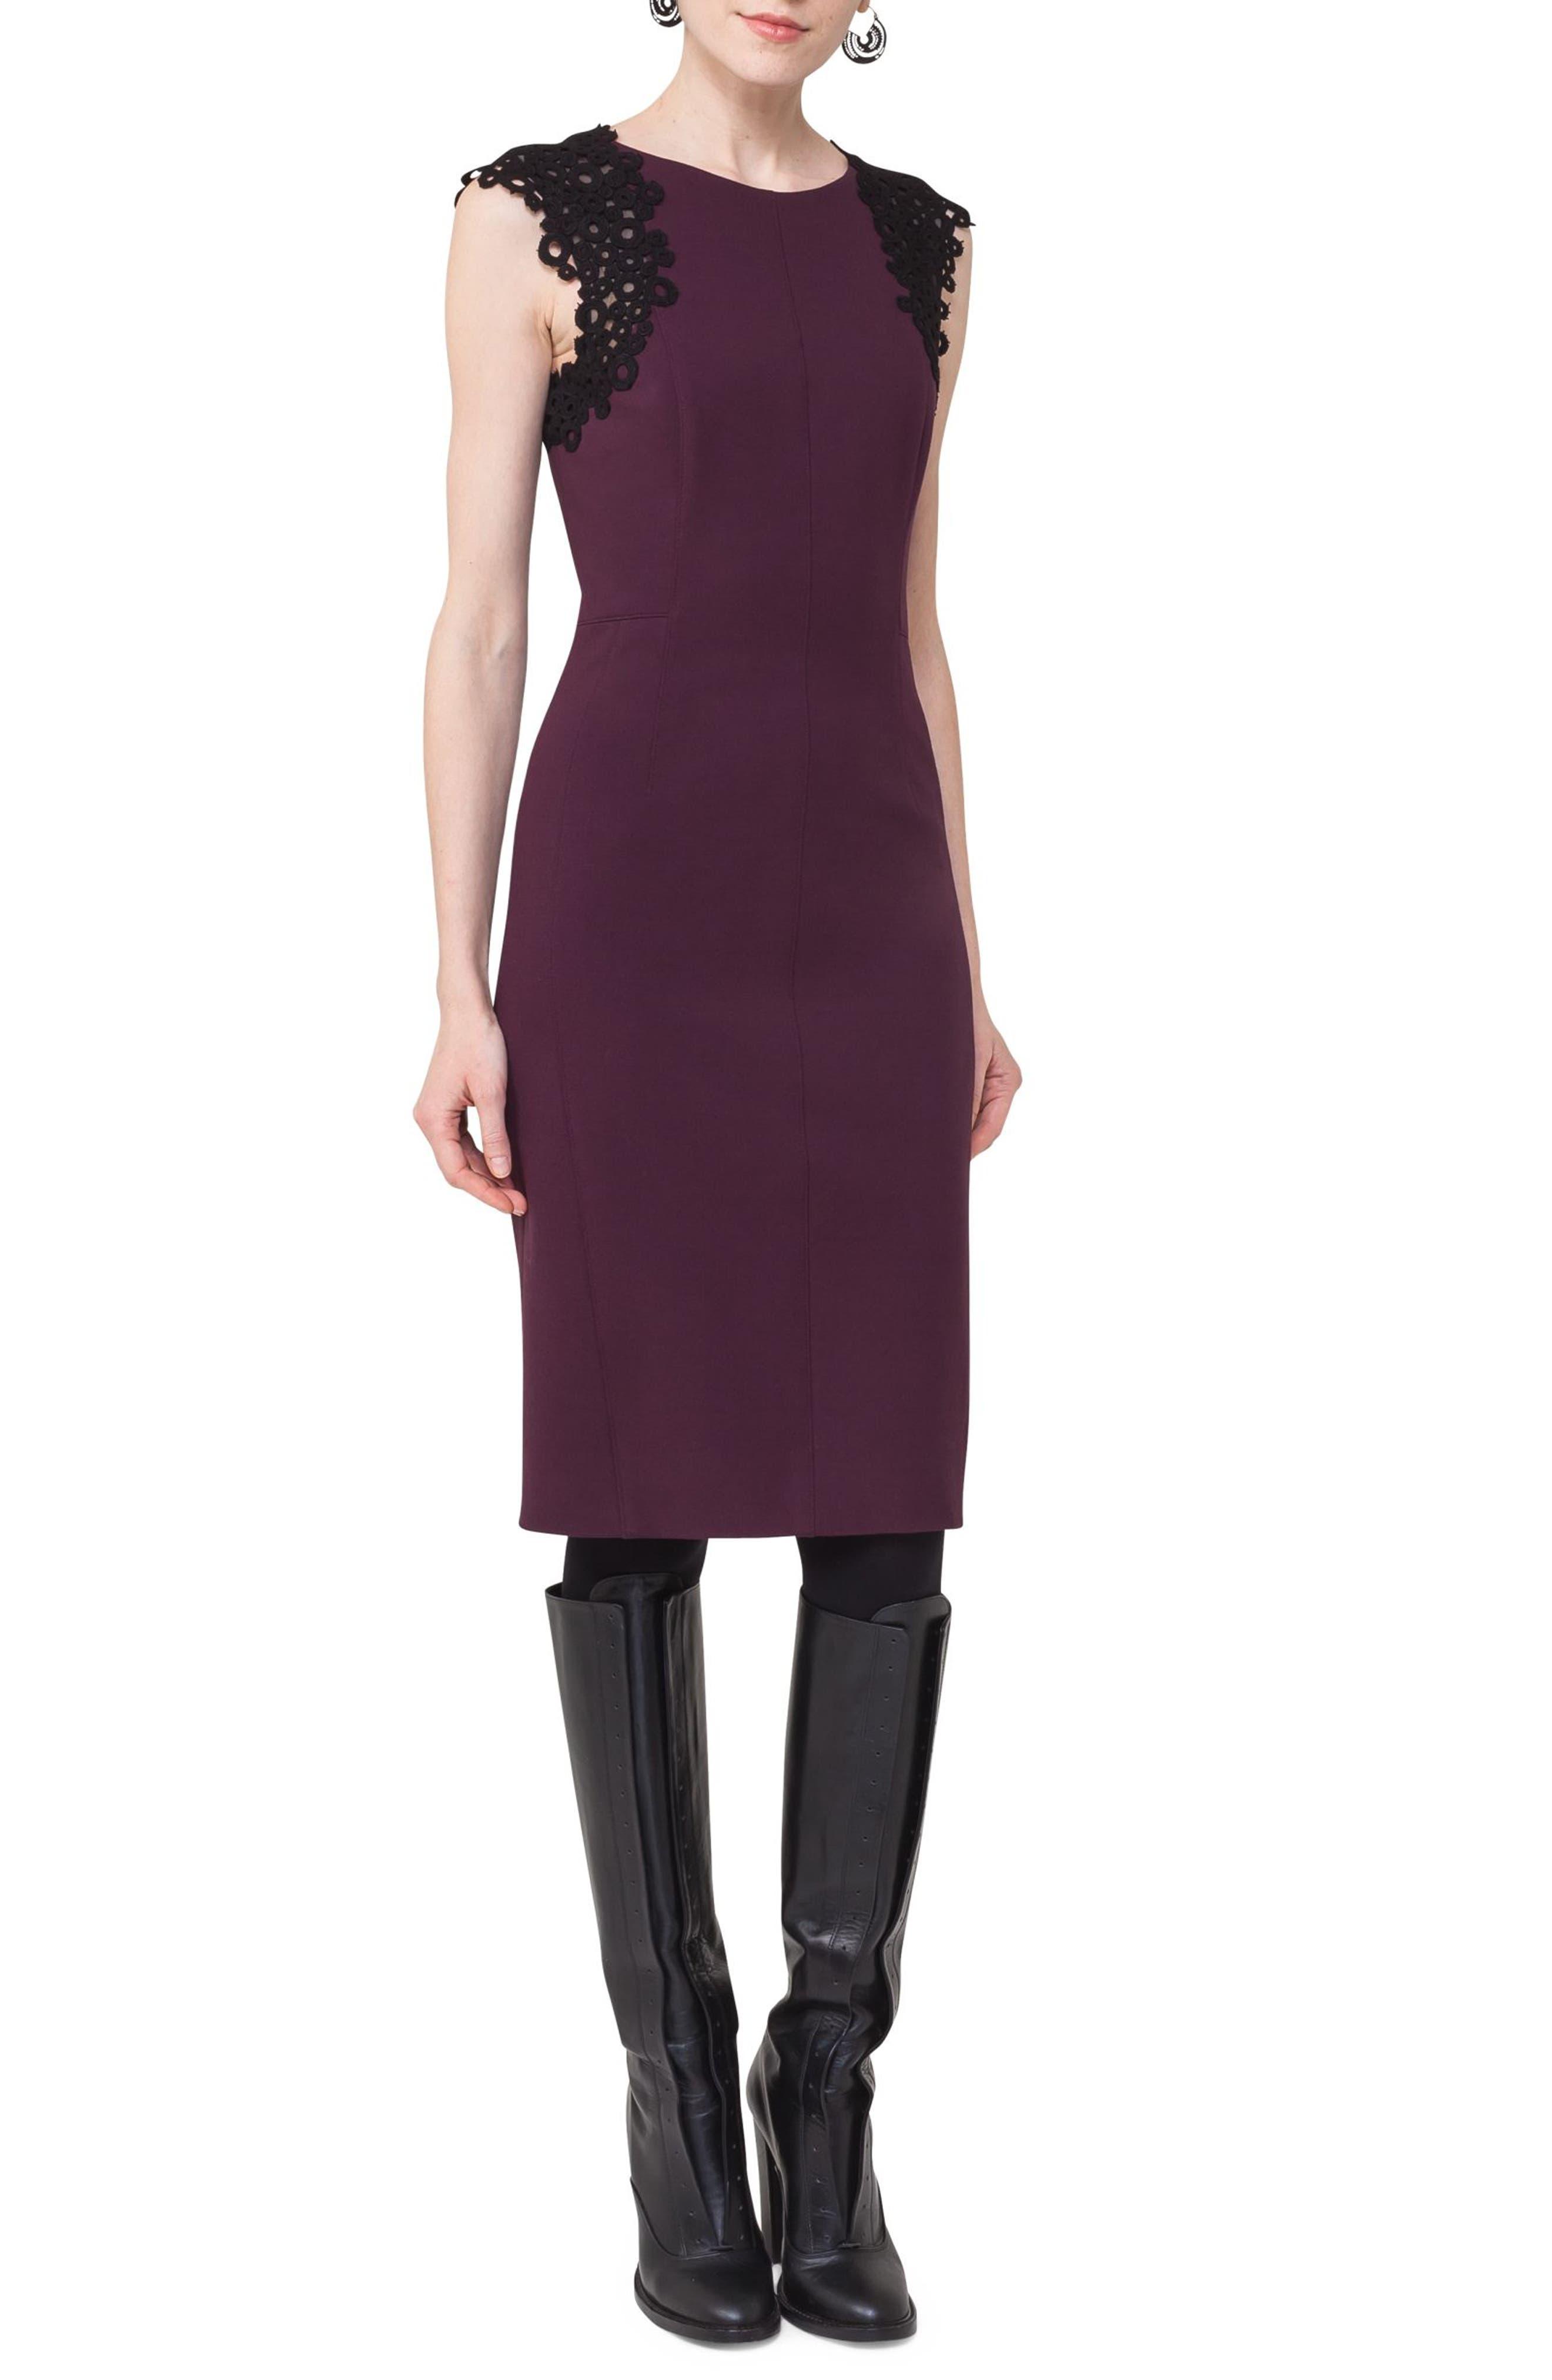 Lace Trim Sheath Dress,                             Alternate thumbnail 3, color,                             930